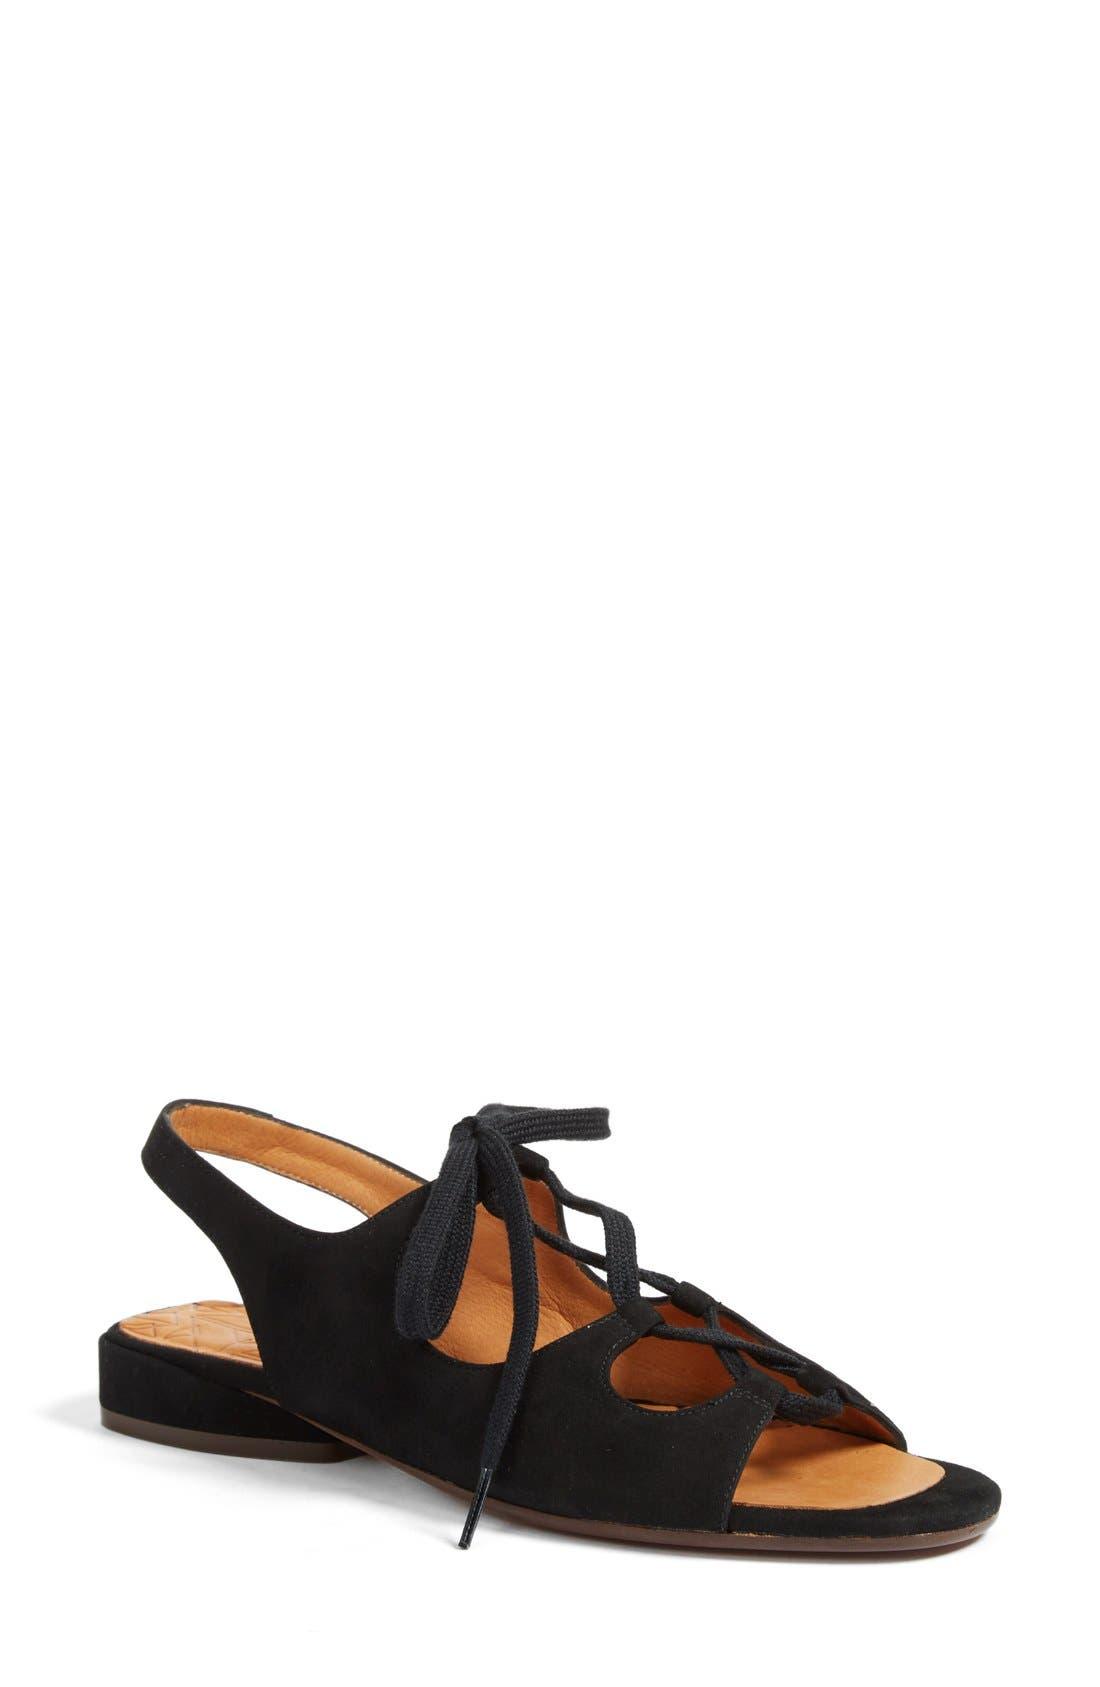 CHIE MIHARA Nalia Lace-Up Sandal